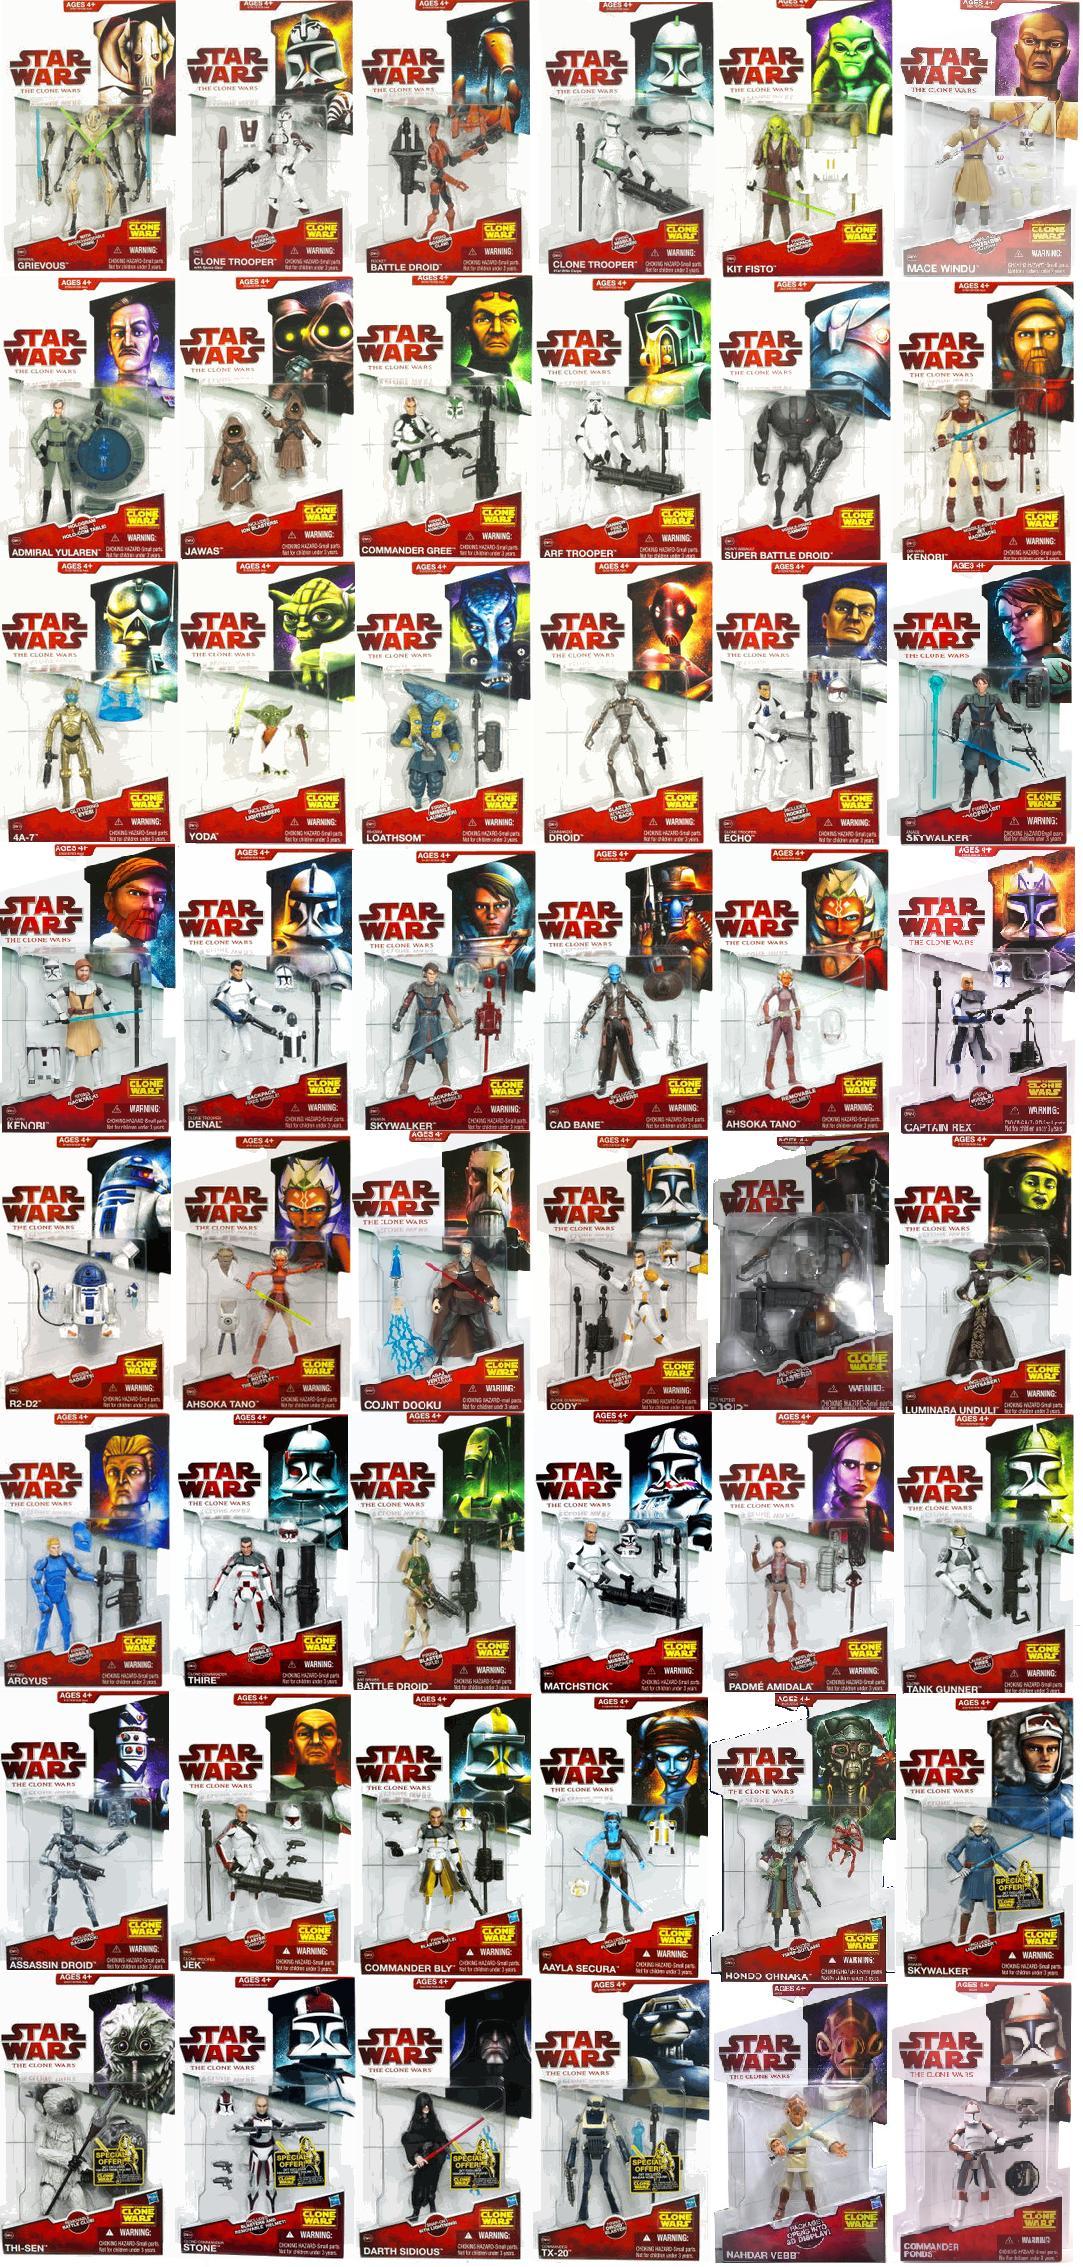 Star Wars: The Clone Wars (toy line) | Wookieepedia | Fandom powered ...